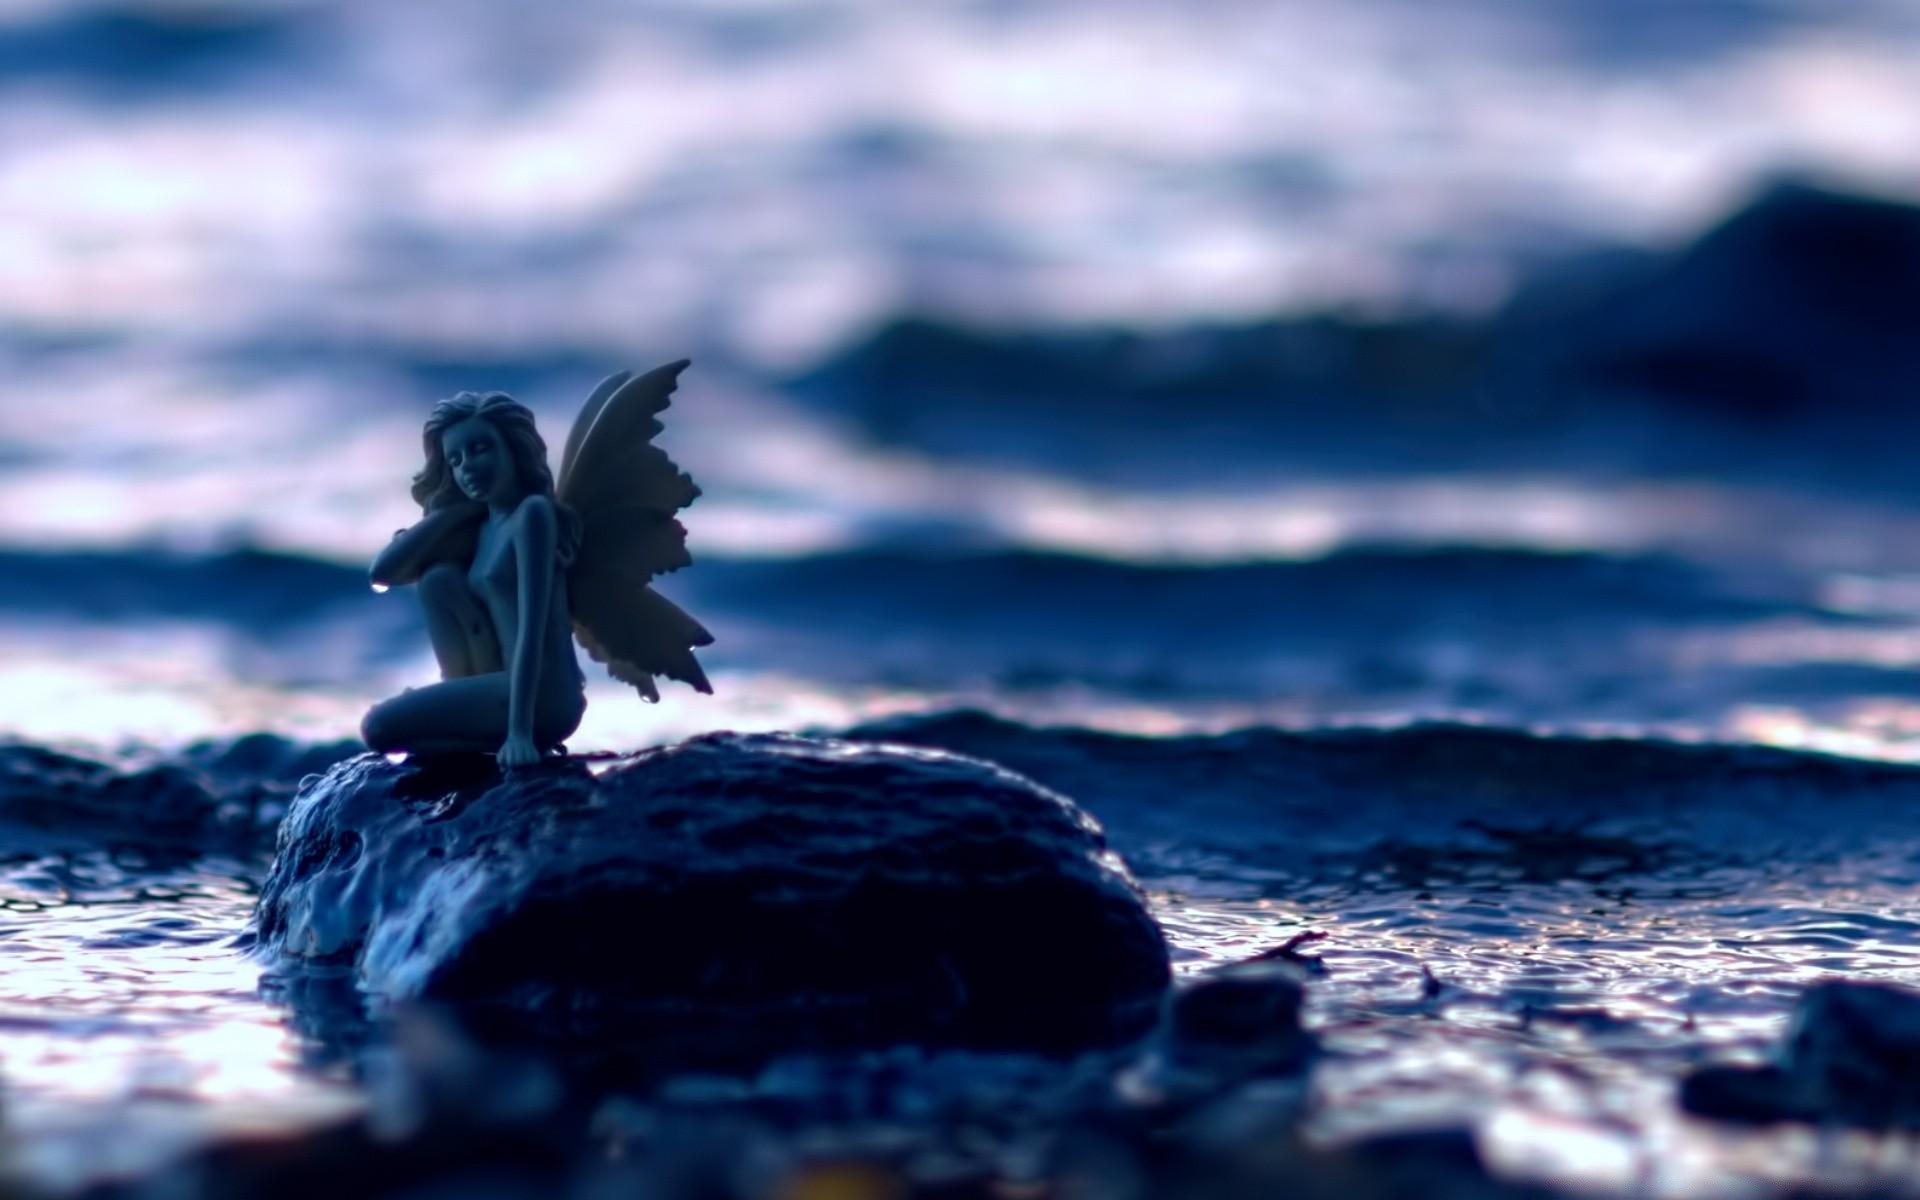 ангел на берегу картинка первой